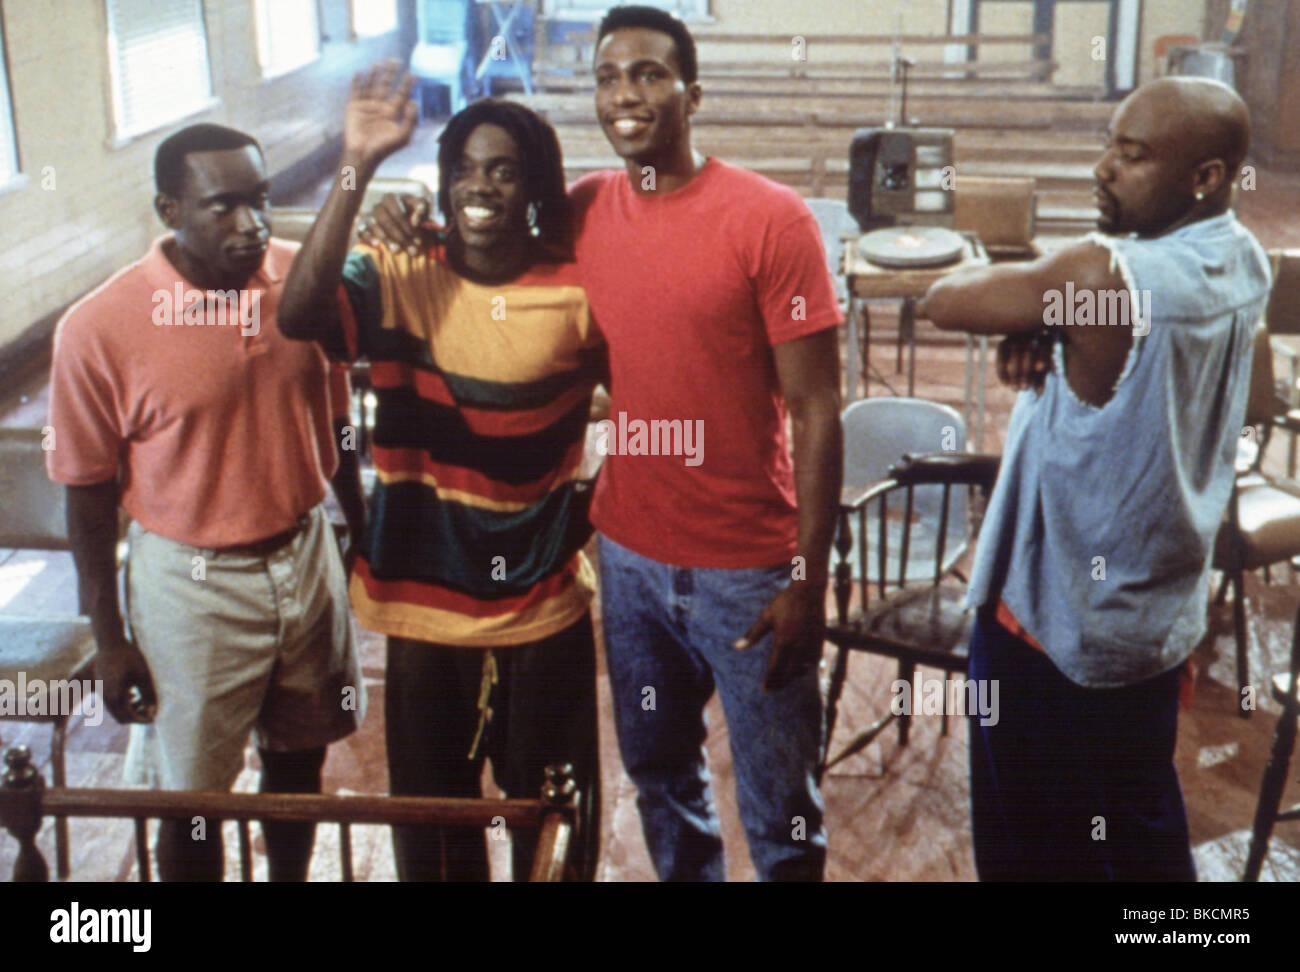 COOL RUNNINGS (1994) RAWLE D LEWIS, DOUG E DOUG, LEON ...